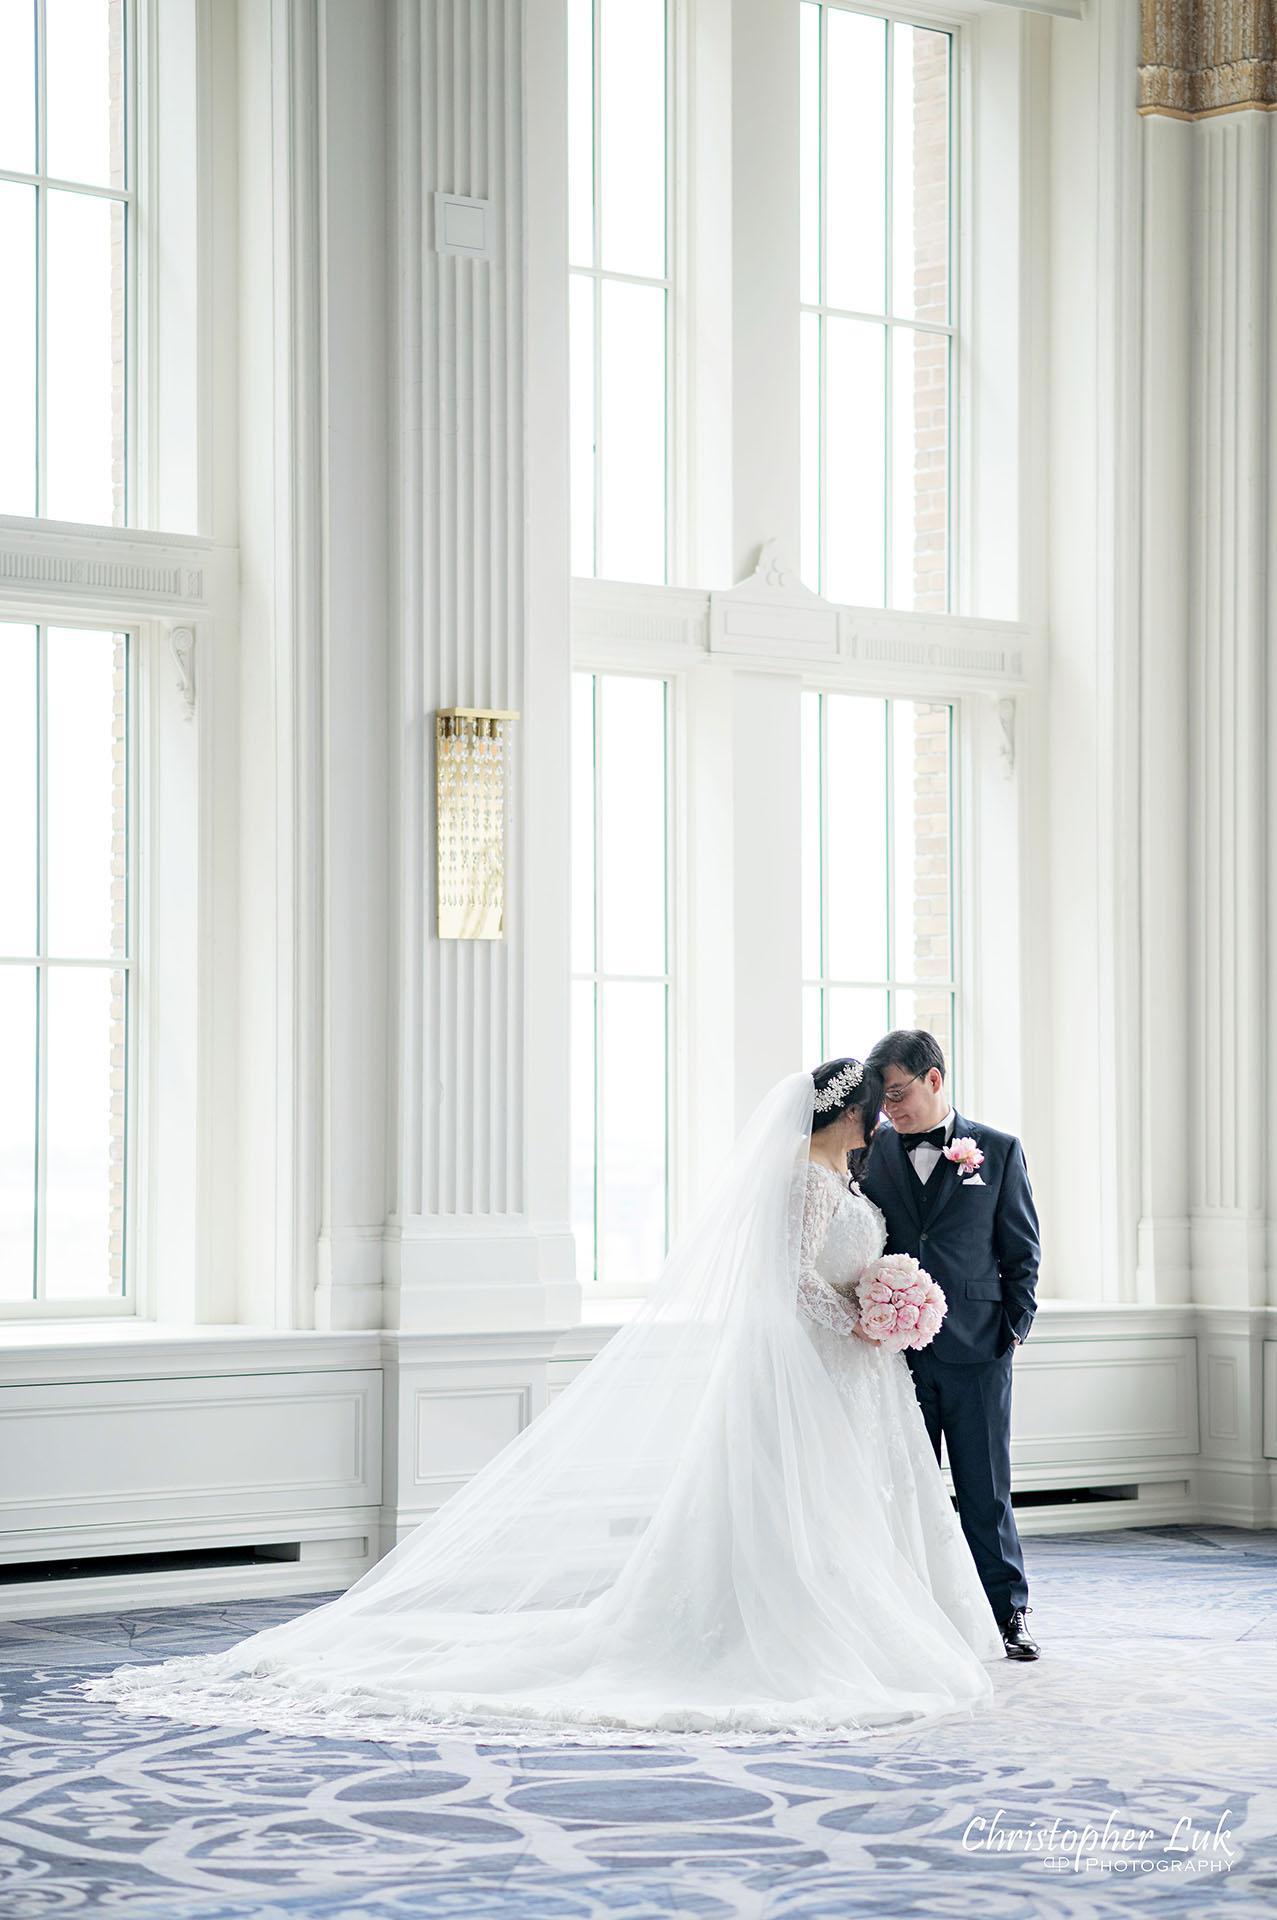 King Edward Hotel Crystal Ballroom Toronto Wedding Photographer MicroWedding Bride Groom Embrace Portrait